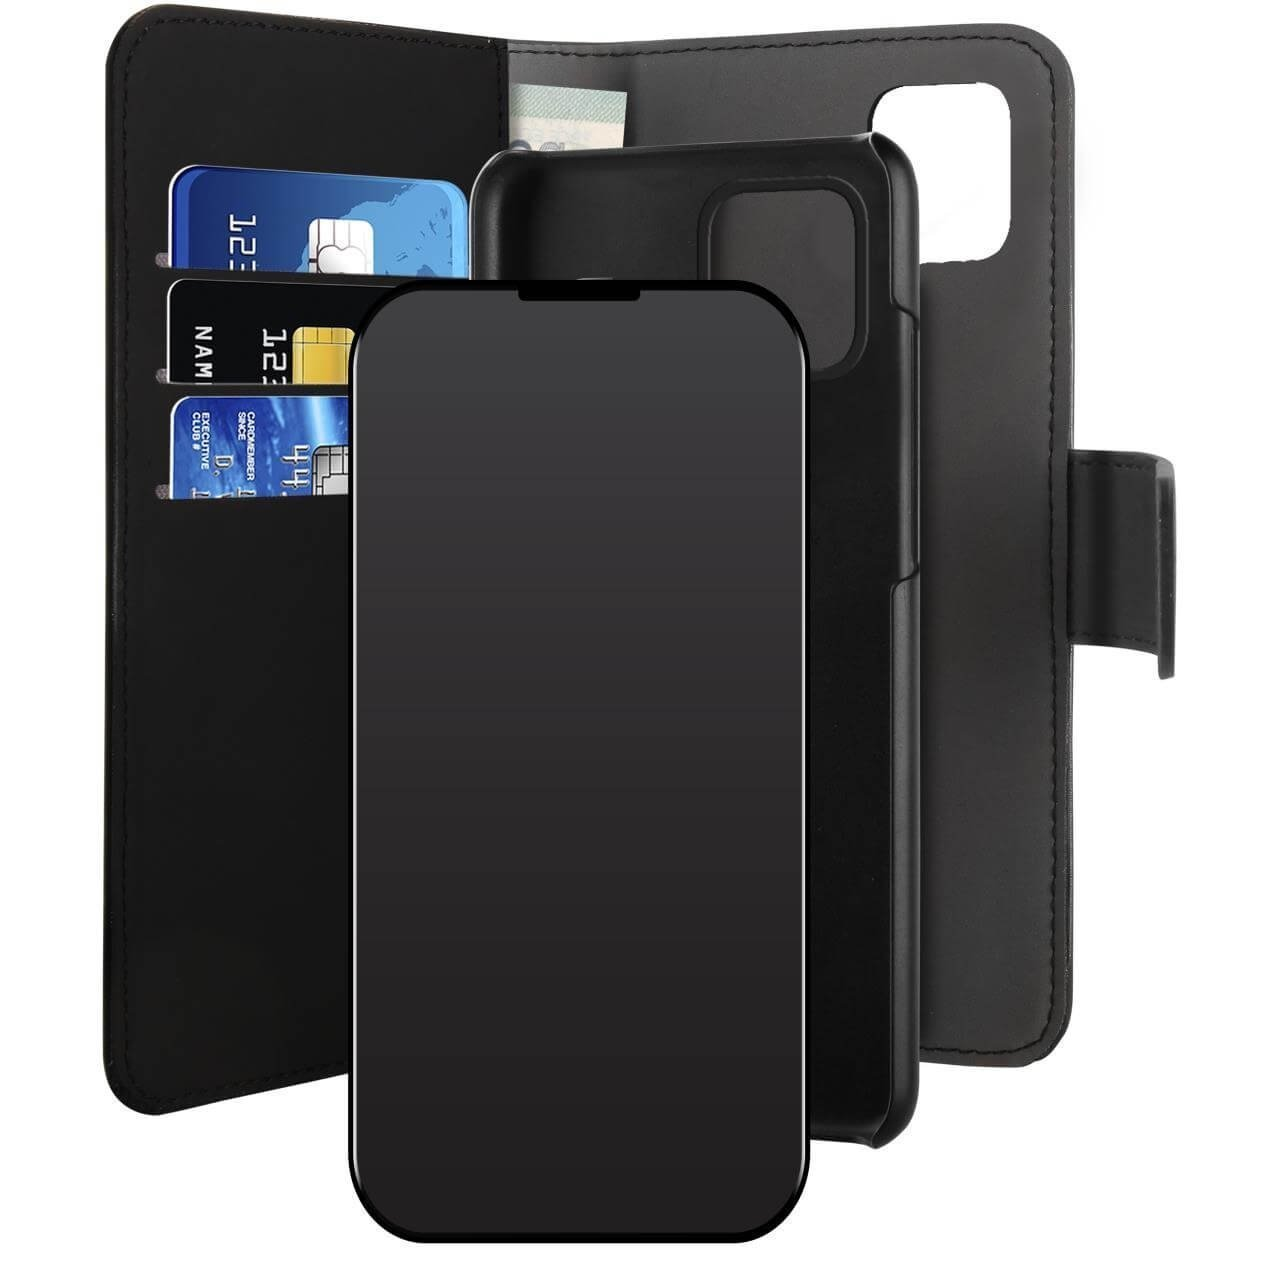 Custodia Detachable 2 in 1 Wallet per iPhone 12 Pro Max-0